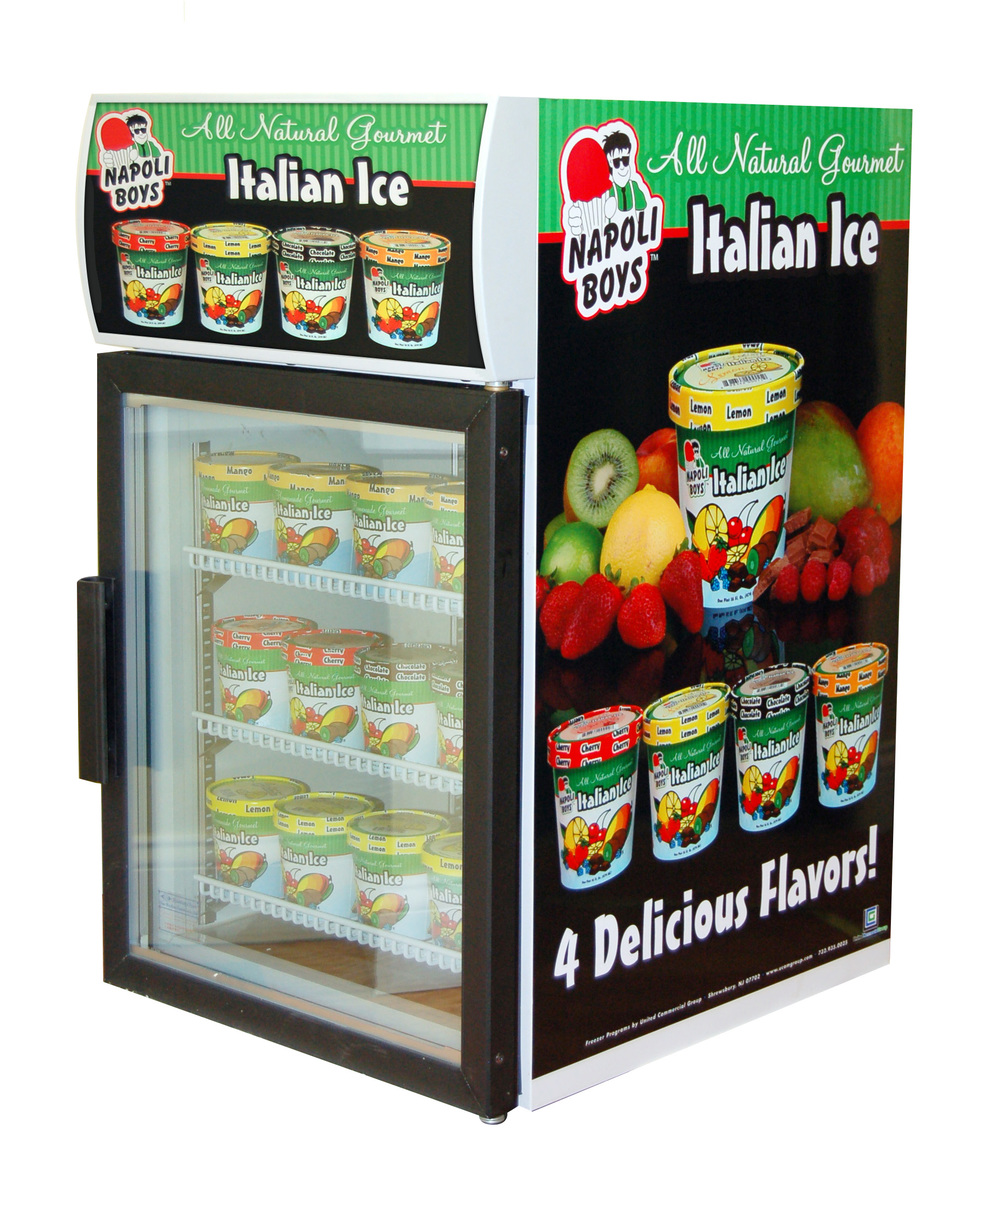 NB-freezer.jpg